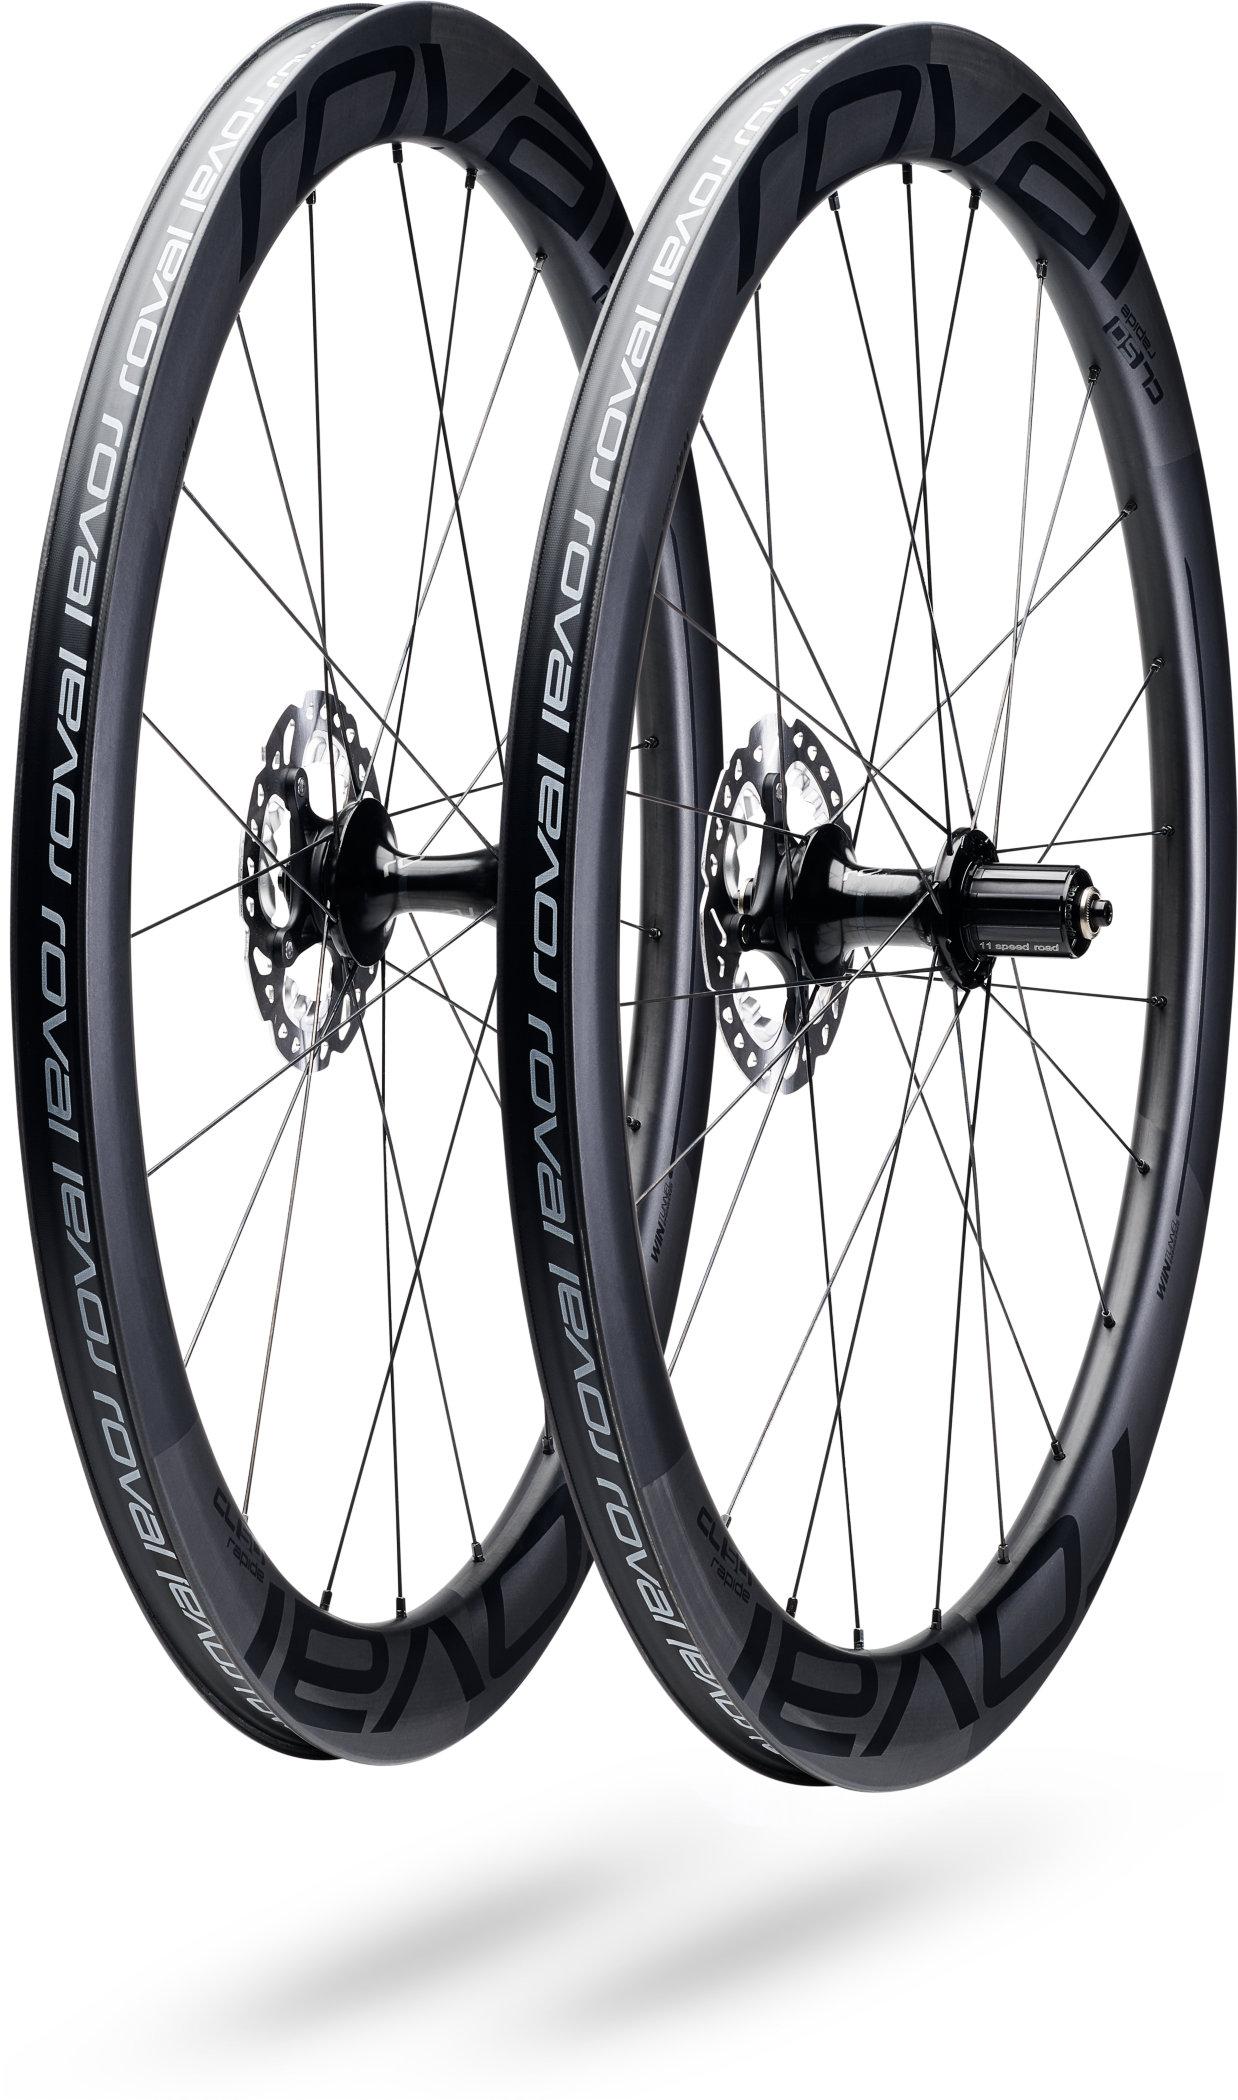 d049996f167 Roval CL 50 Disc Wheelset | Specialized.com